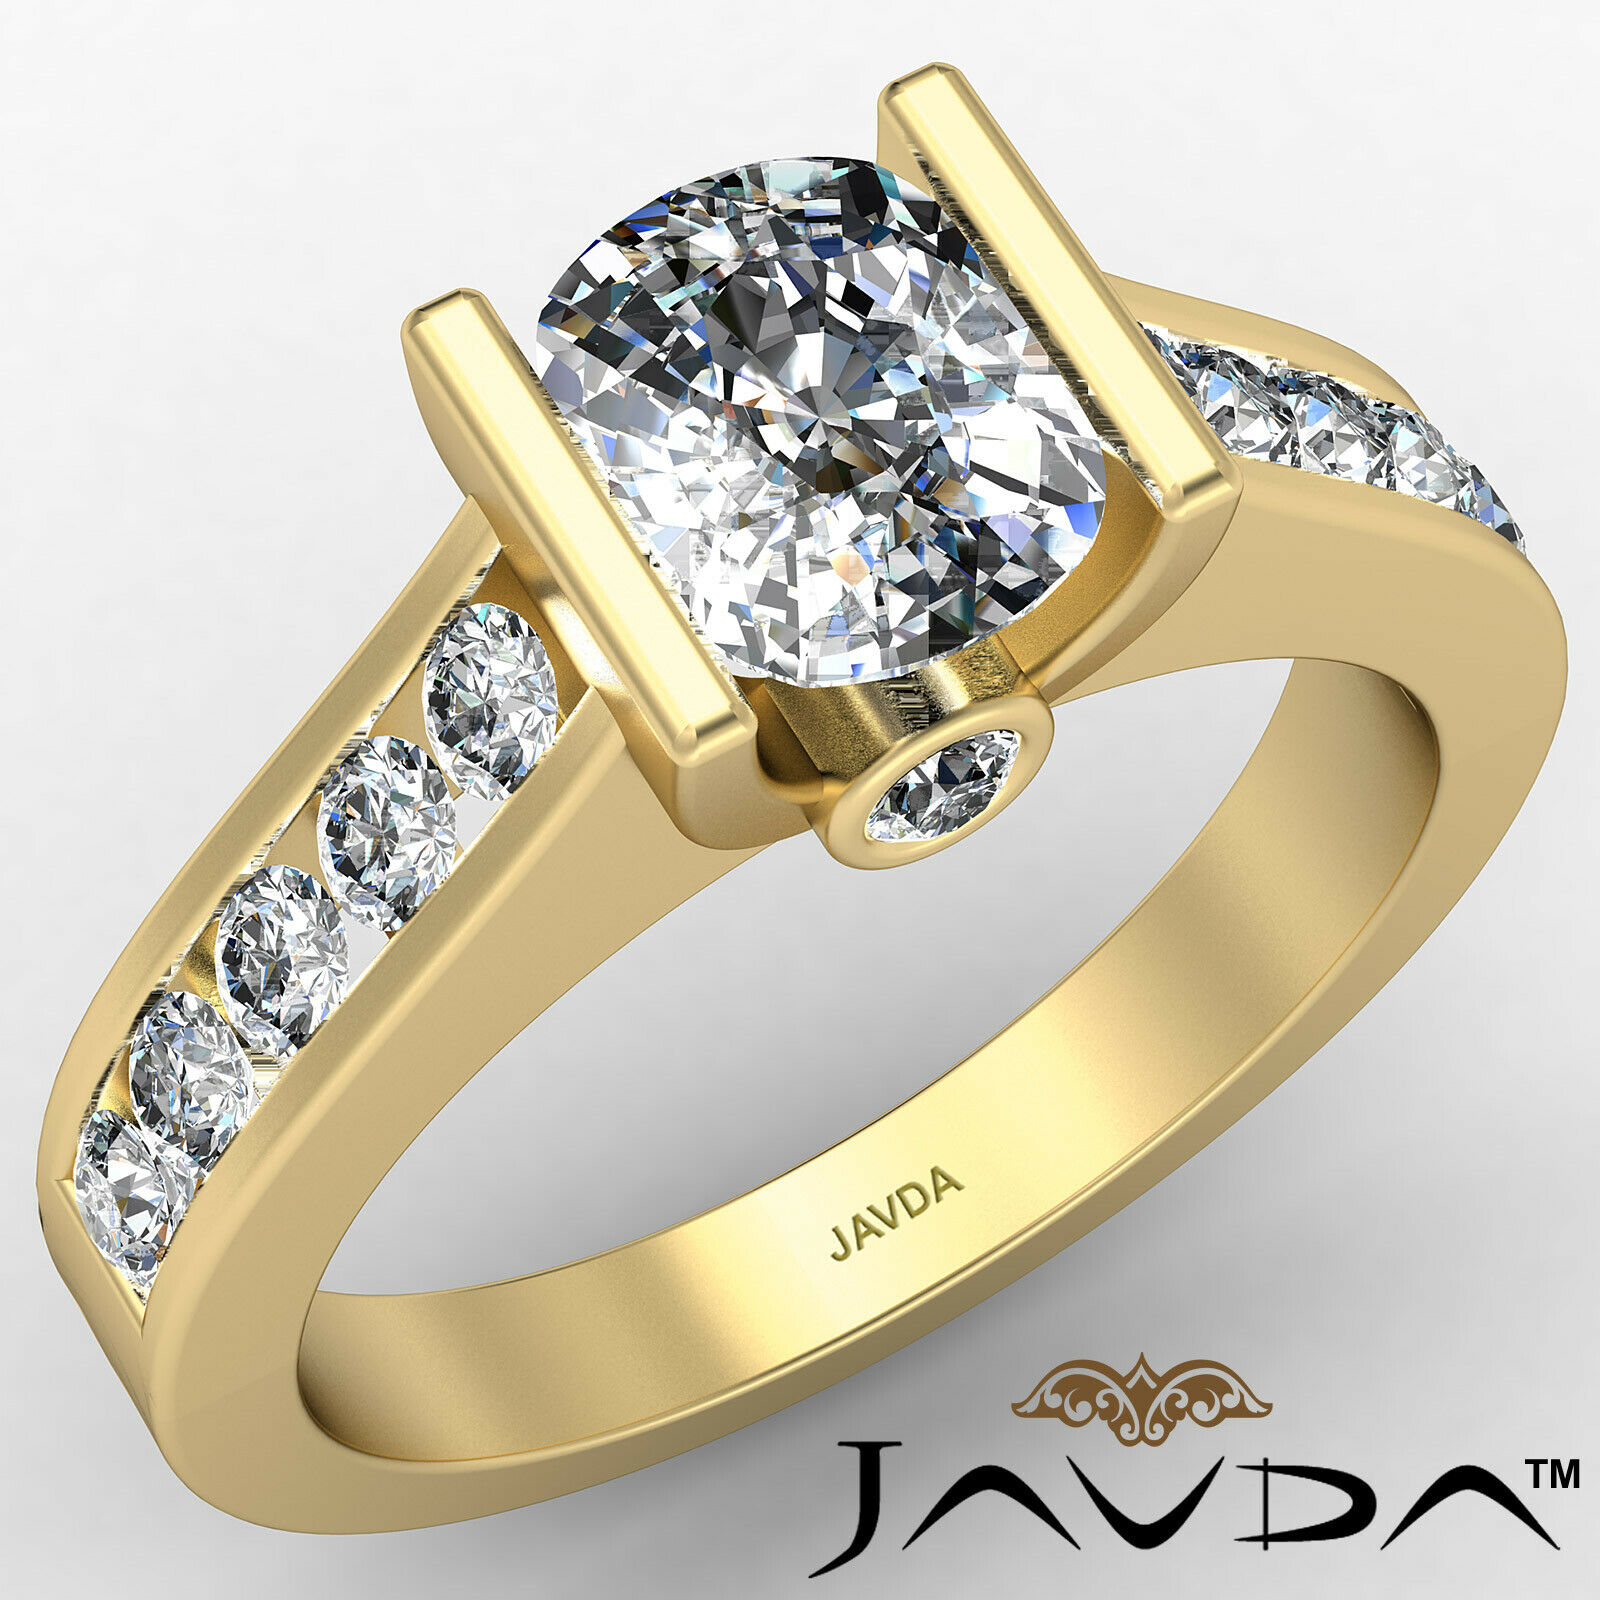 Bezel Cushion Diamond Engagement Women's Ring GIA, J Color SI1 clarity 1.53 ctw. 1